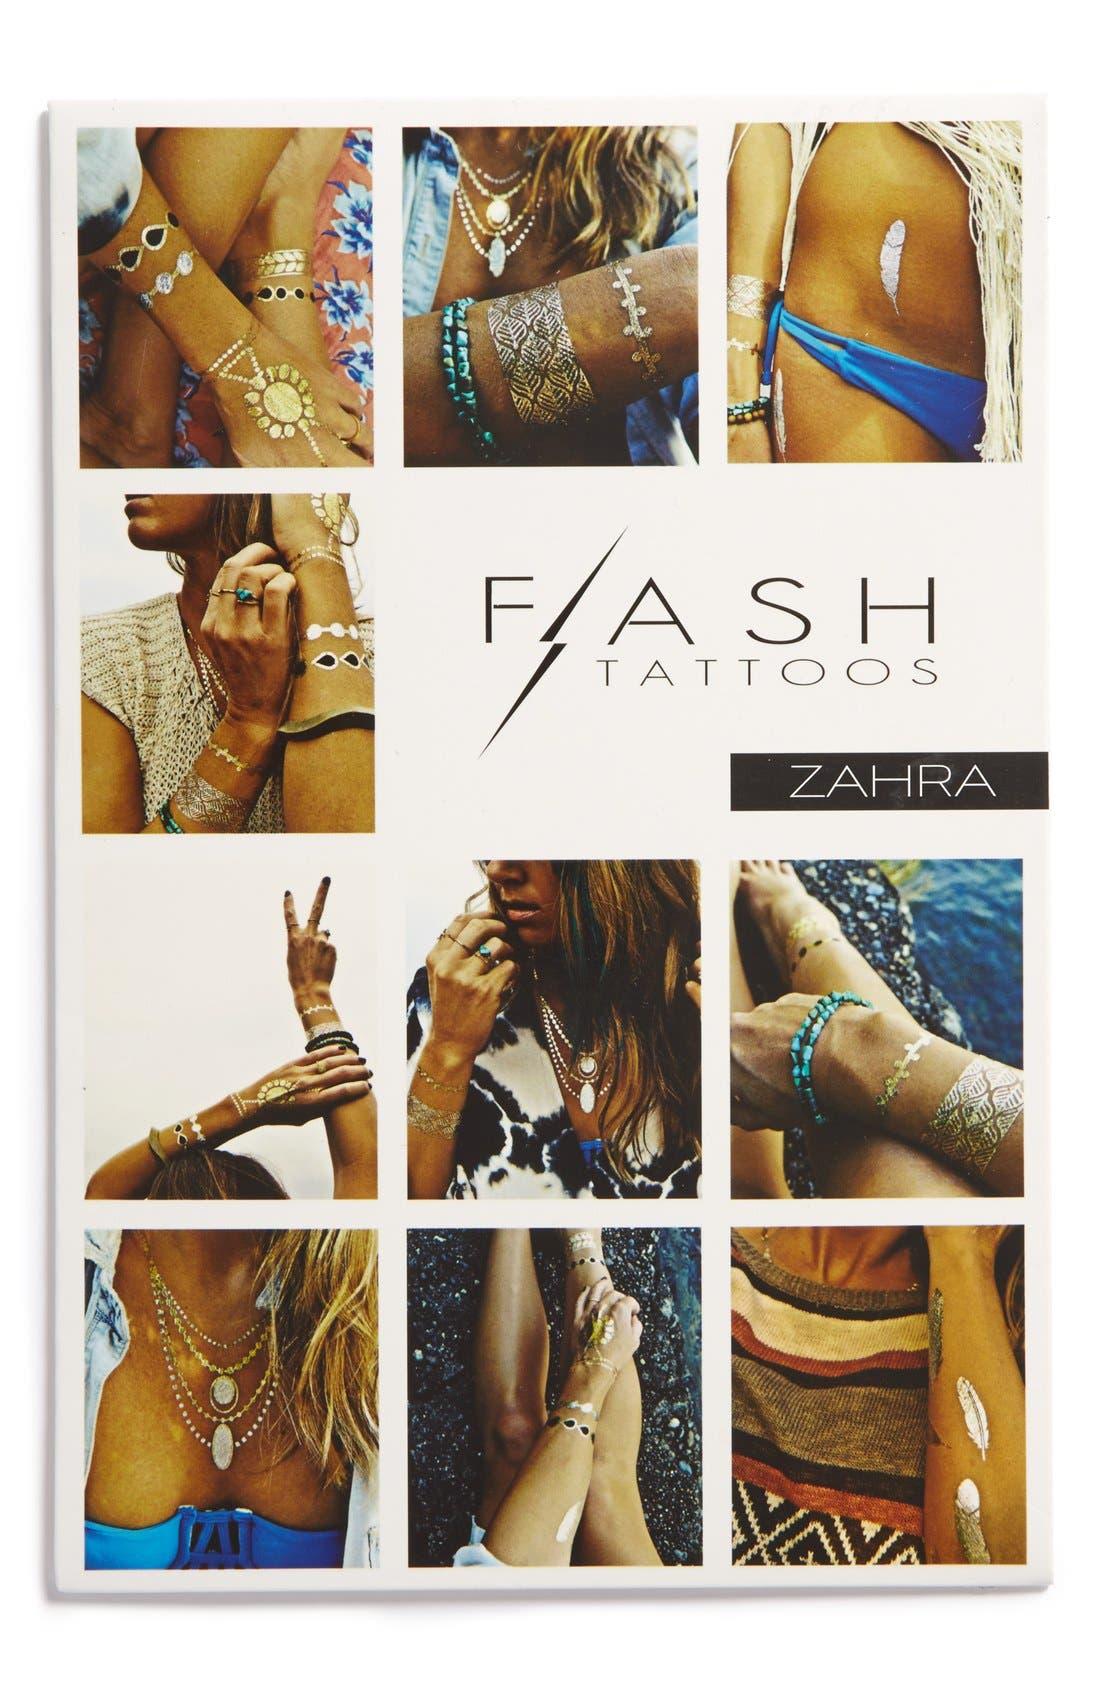 Alternate Image 1 Selected - Flash Tattoos 'Zahra' Temporary Tattoos